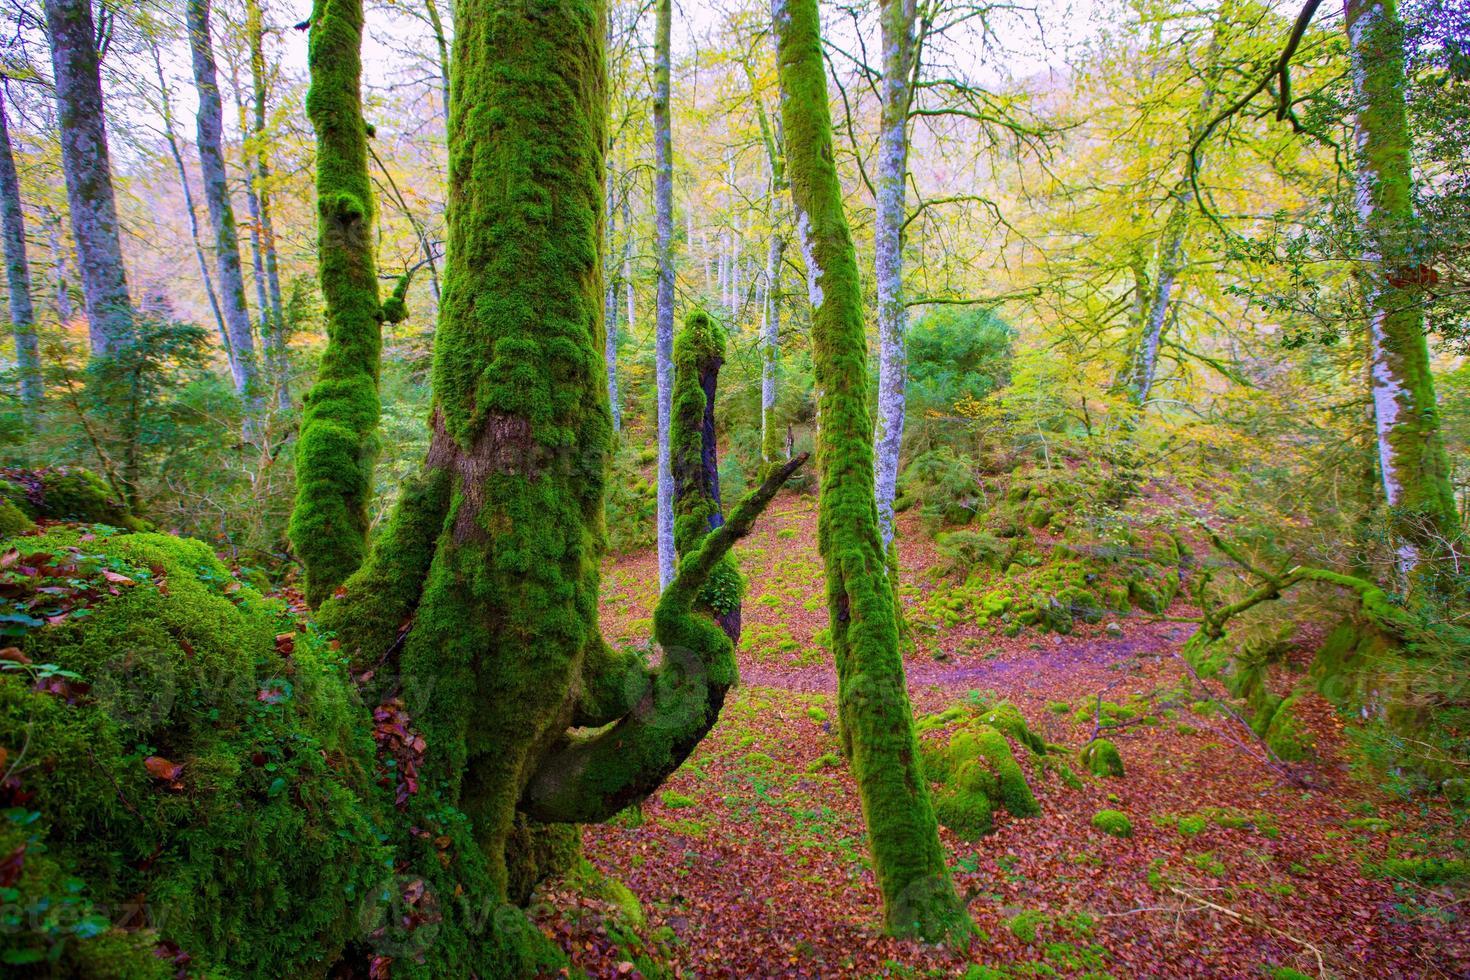 Herbst Selva de Irati Buche Dschungel in Navarra Pyrenäen Spanien foto